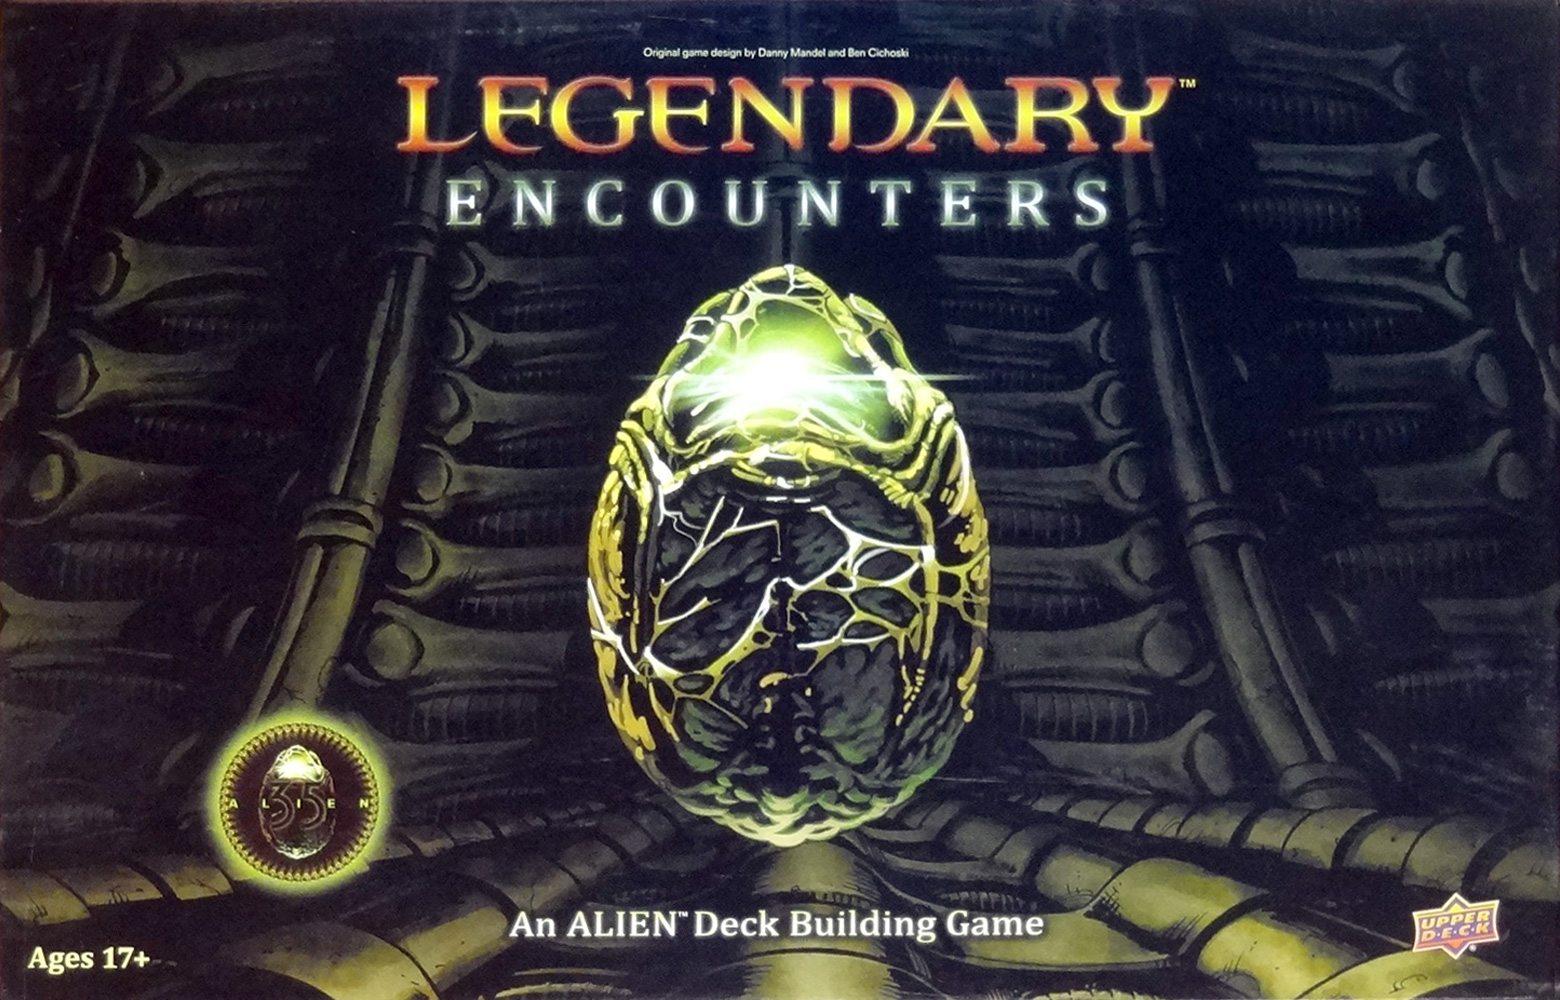 LegendaryEncounters box cover